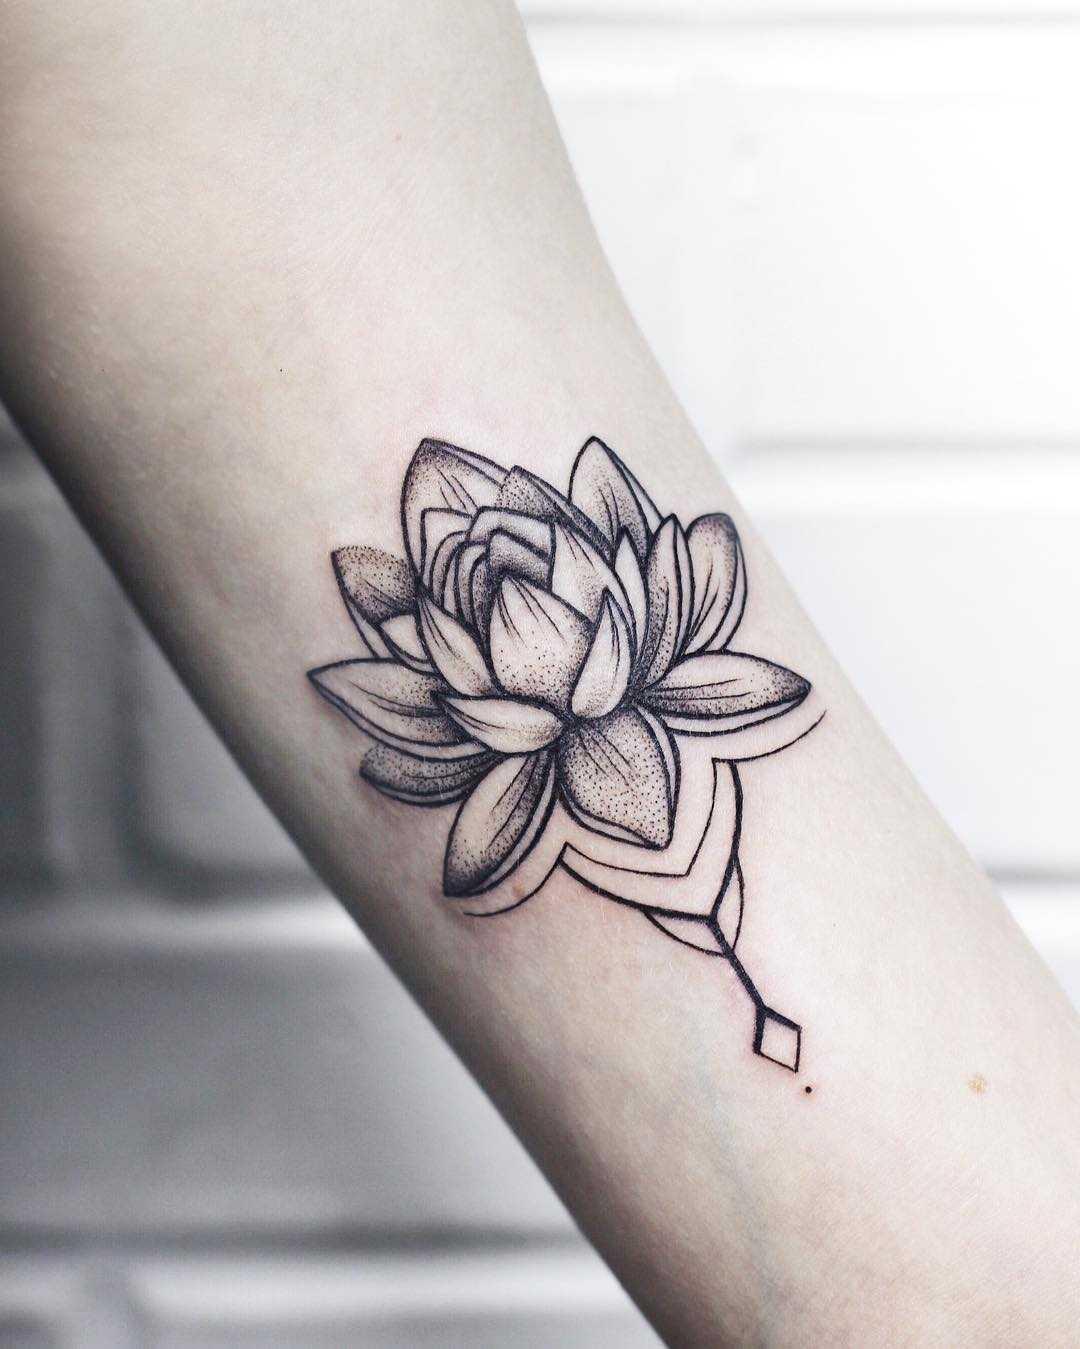 e9283bfa6 Tiny tender lotus tattoo - Tattoogrid.net